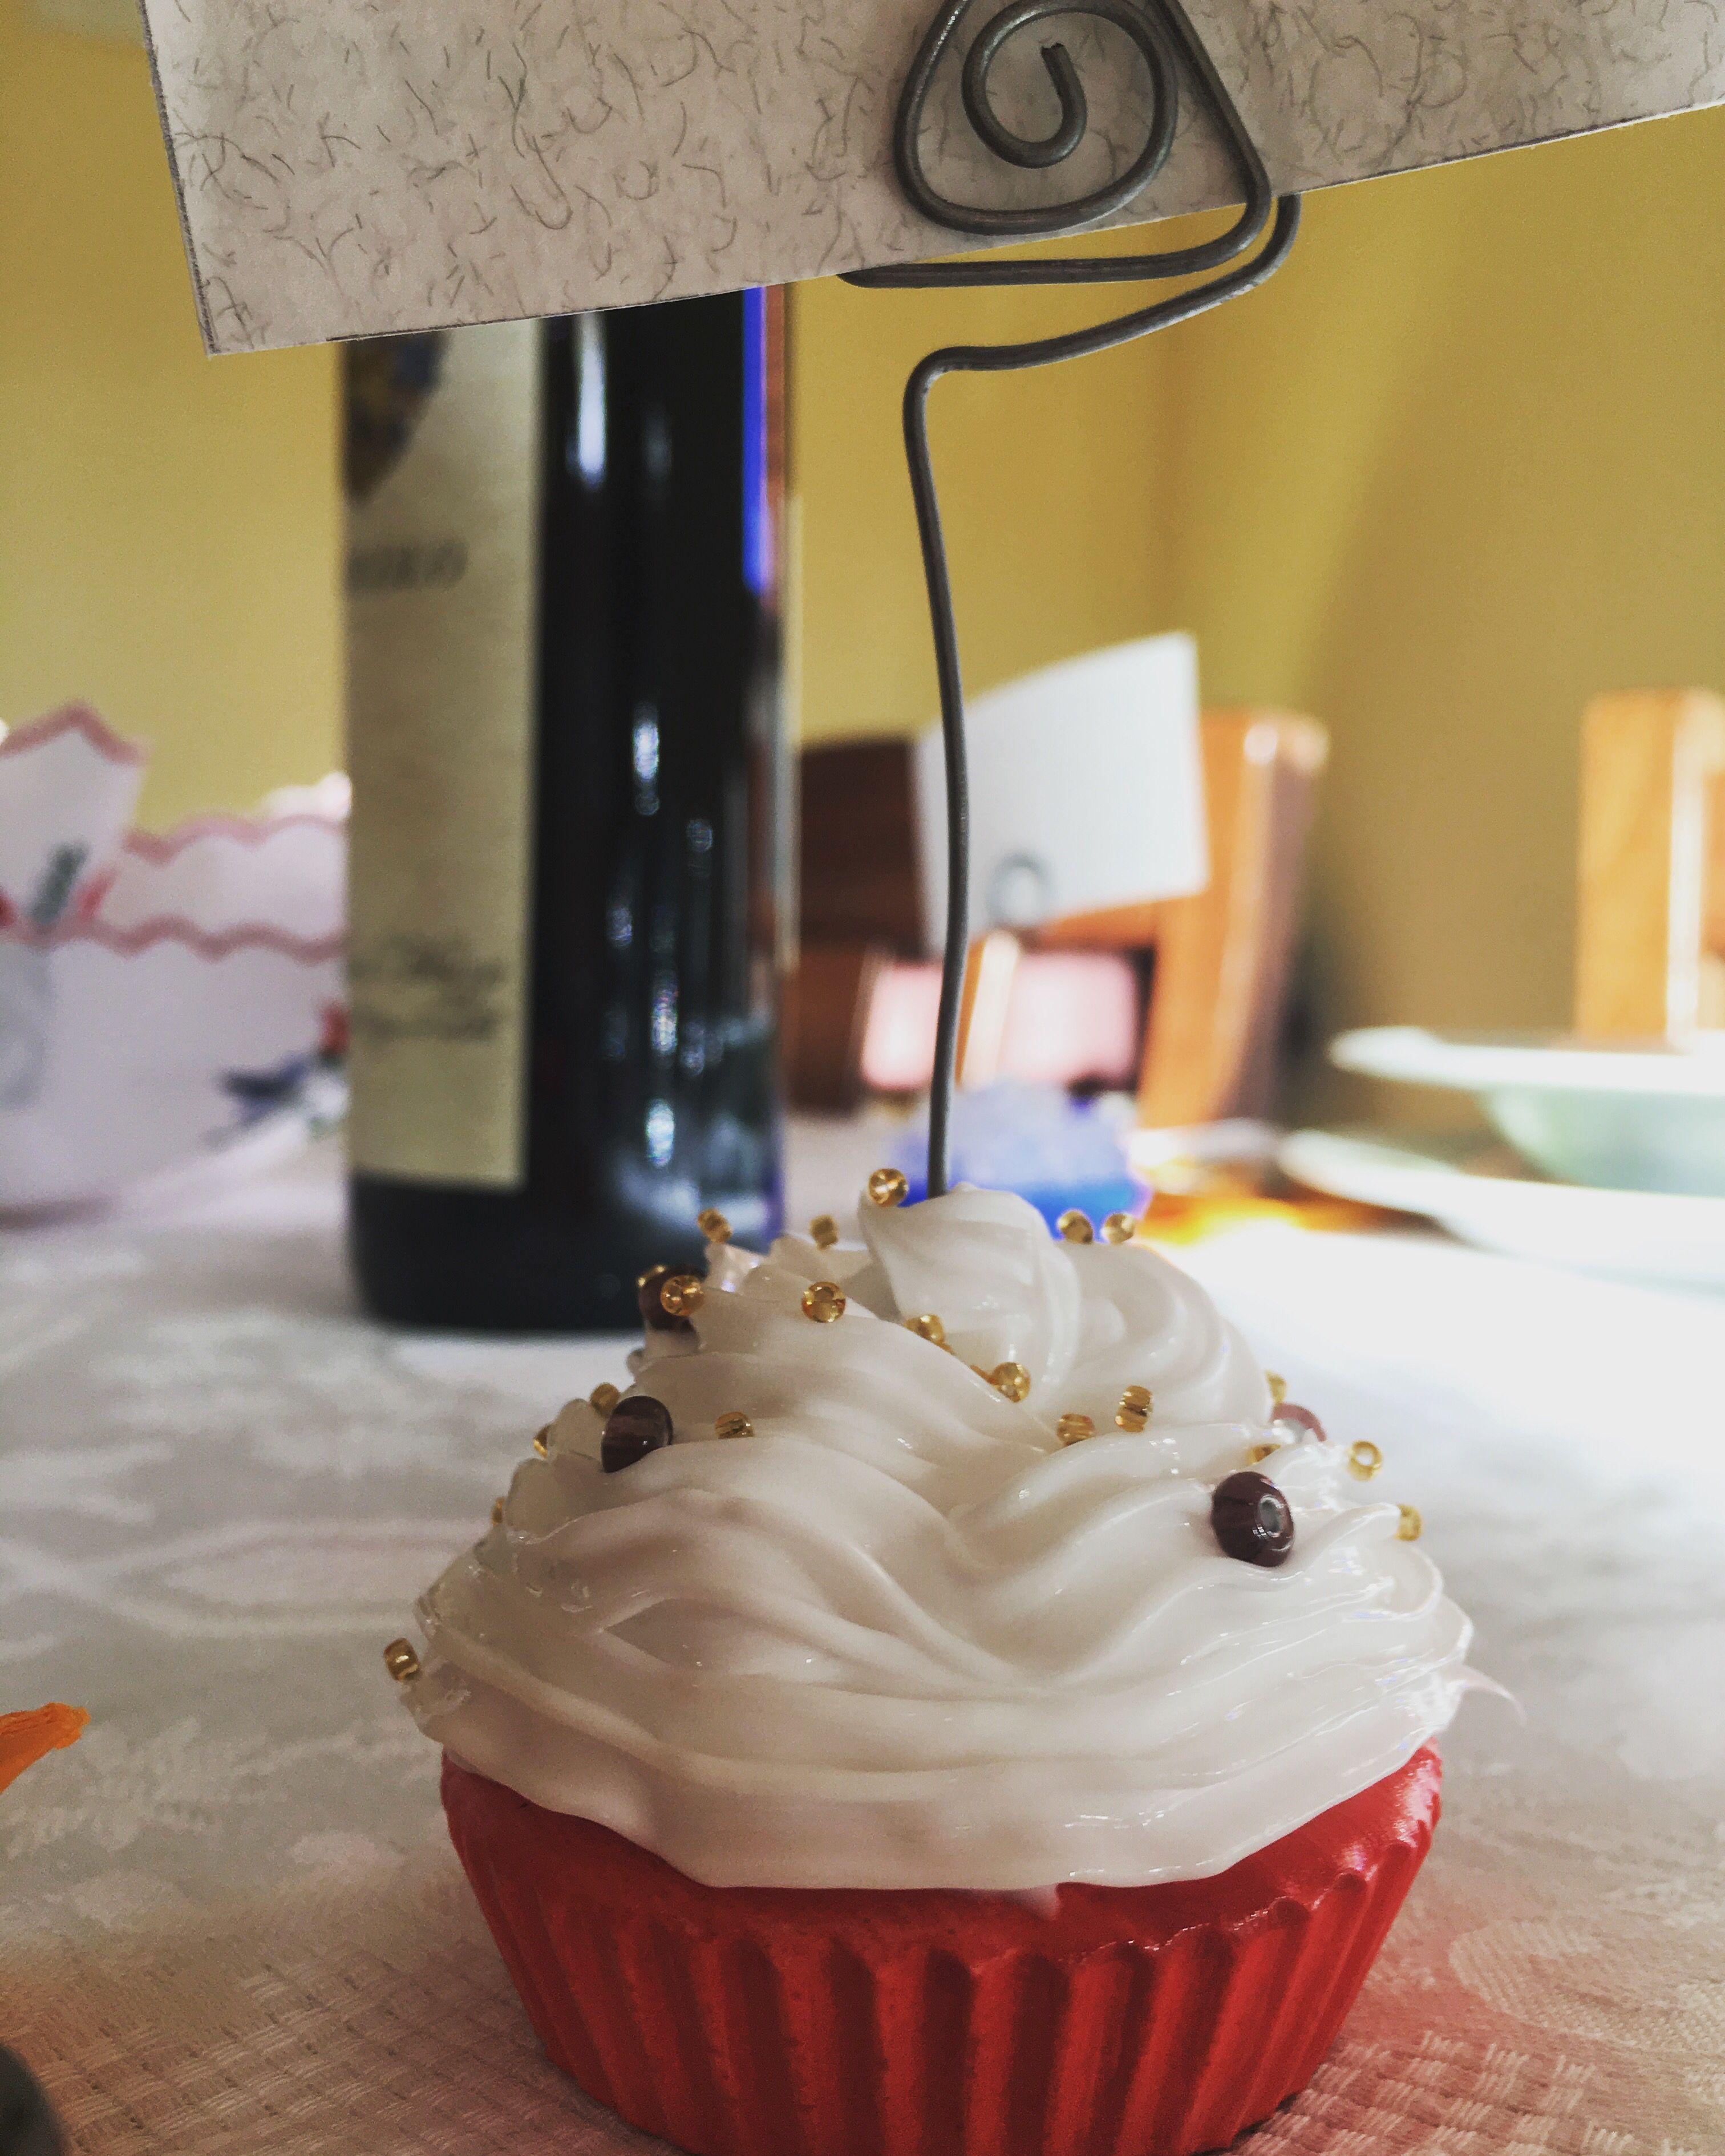 Cupcake Matrimonio Segnaposto.Capcake Segnaposto Per Serate Tra Amici Segnaposto Matrimonio